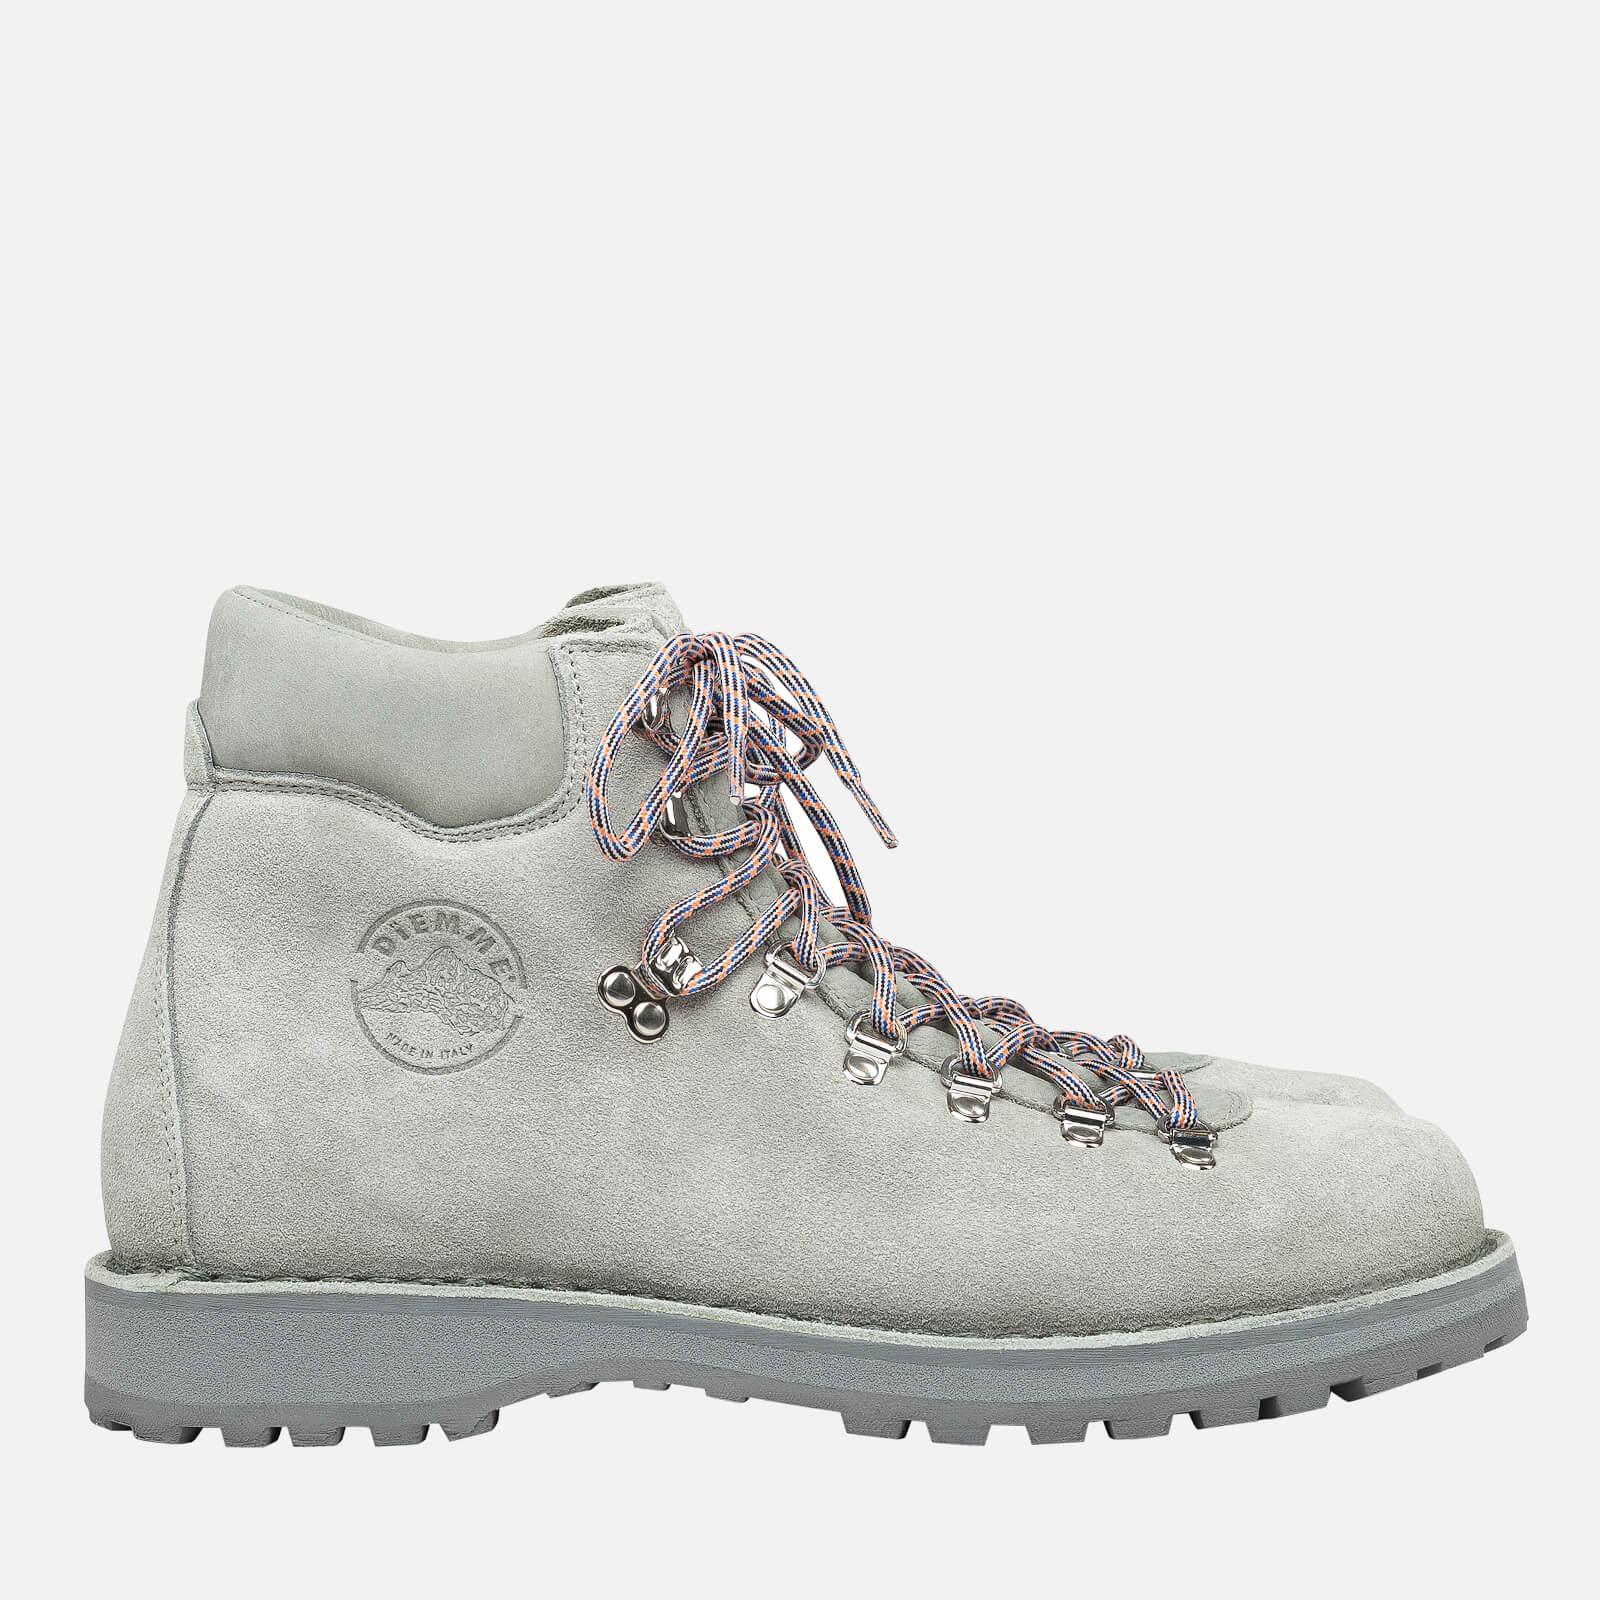 Diemme Women's Roccia Vet Suede Hiking Style Boots - Grey - Uk 3/Eu 35